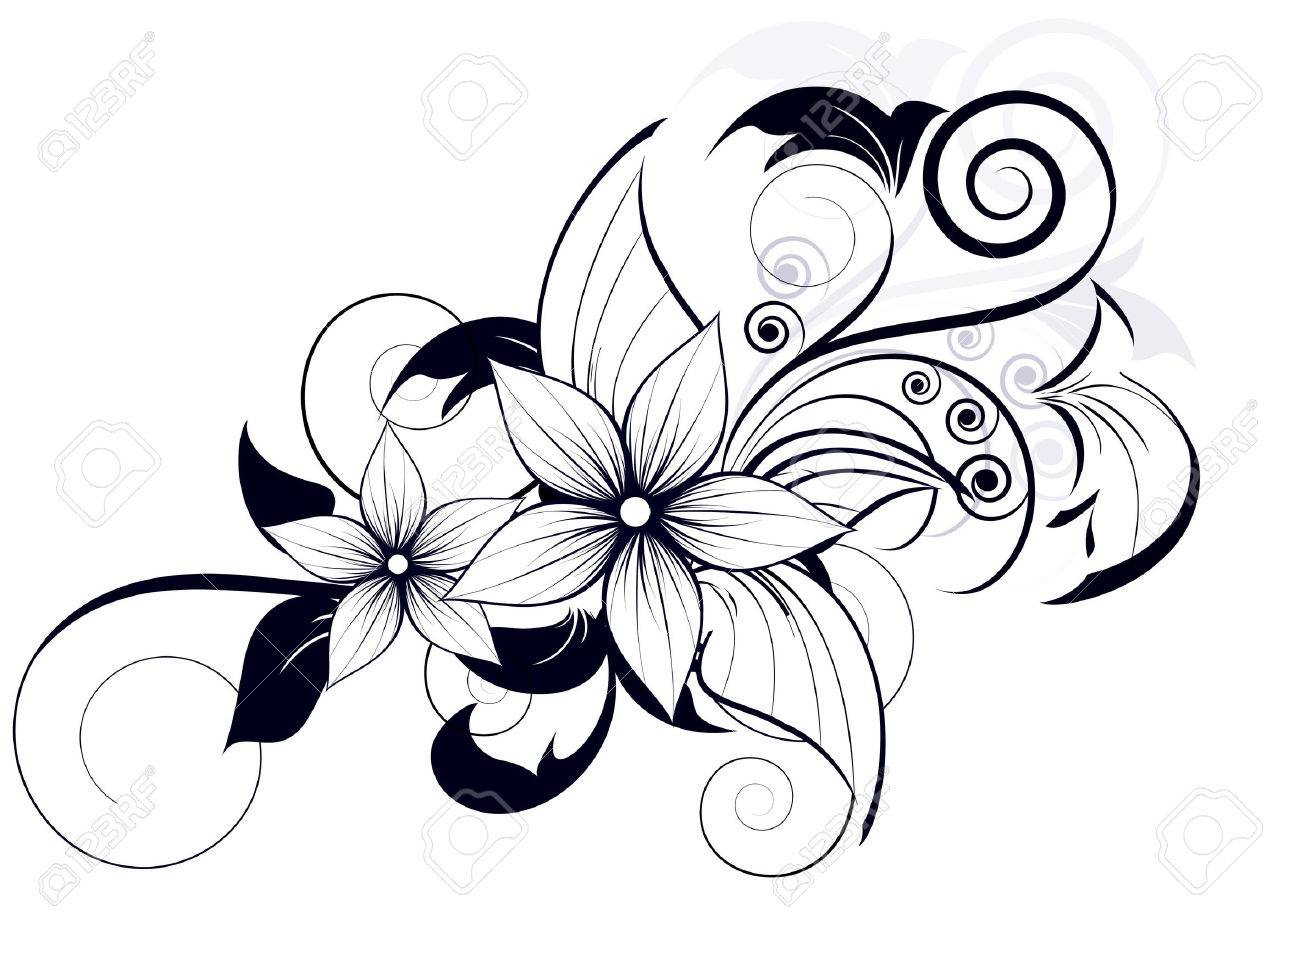 Black Swirl Design Png Black Swirls Designs Png